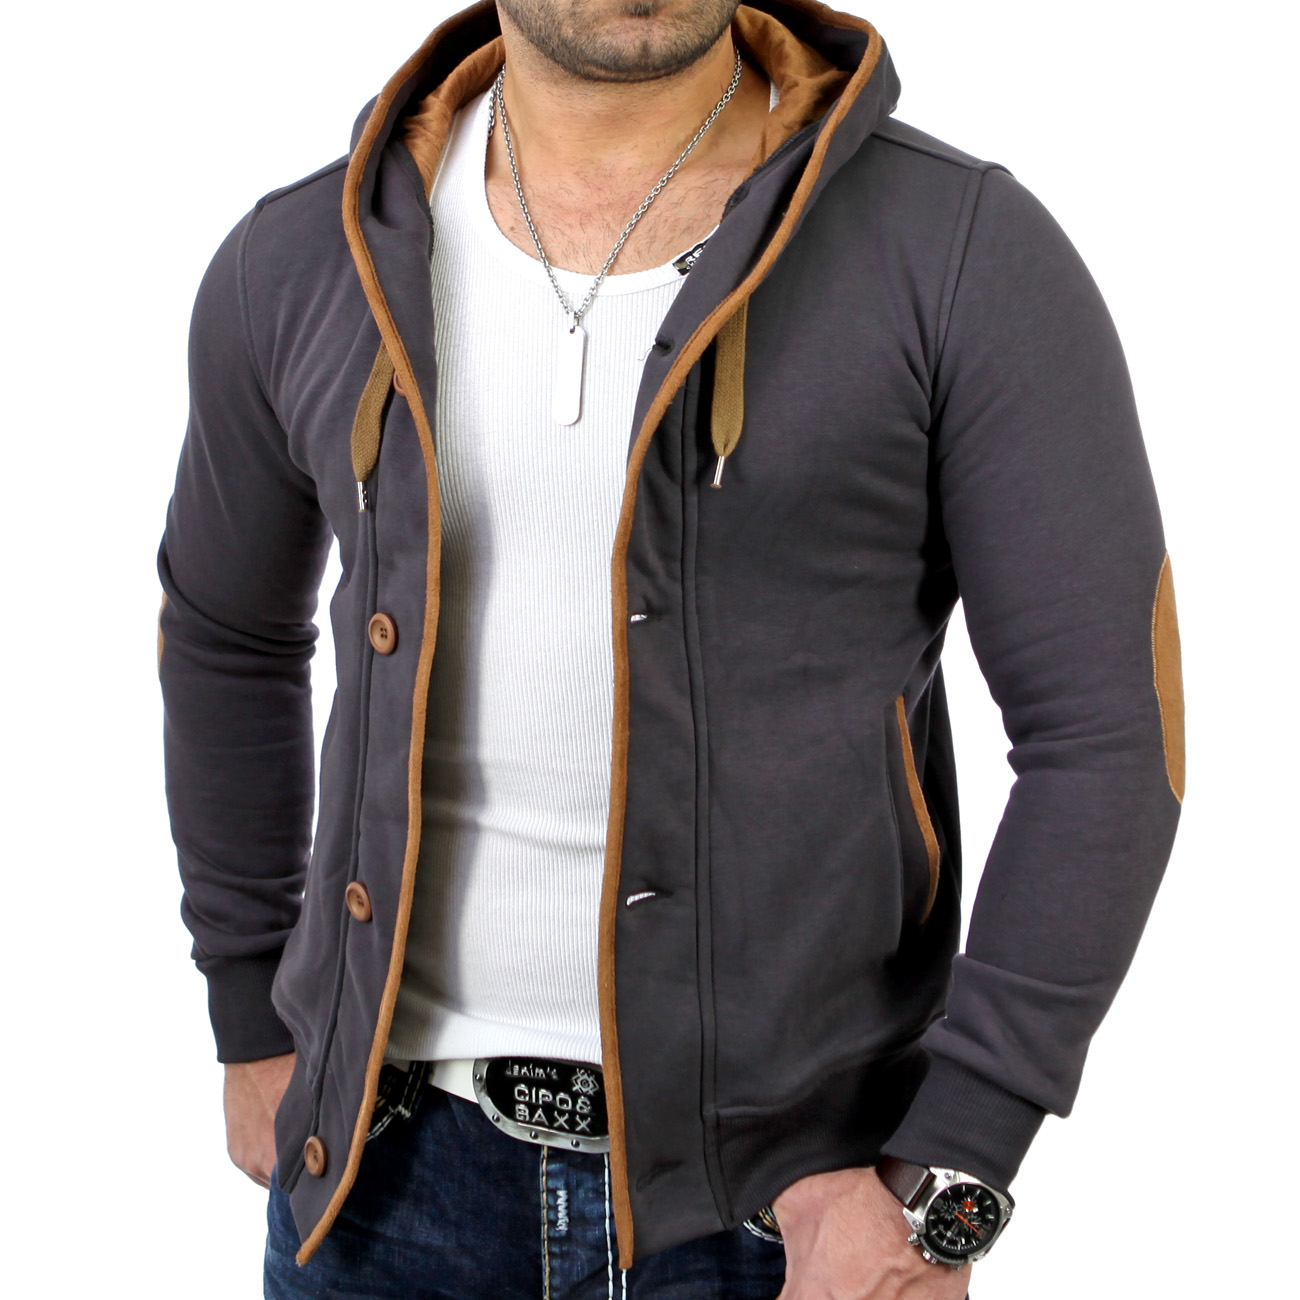 reslad rs 5066 herren kapuzen sweat jacke pullover hoody t shirt. Black Bedroom Furniture Sets. Home Design Ideas